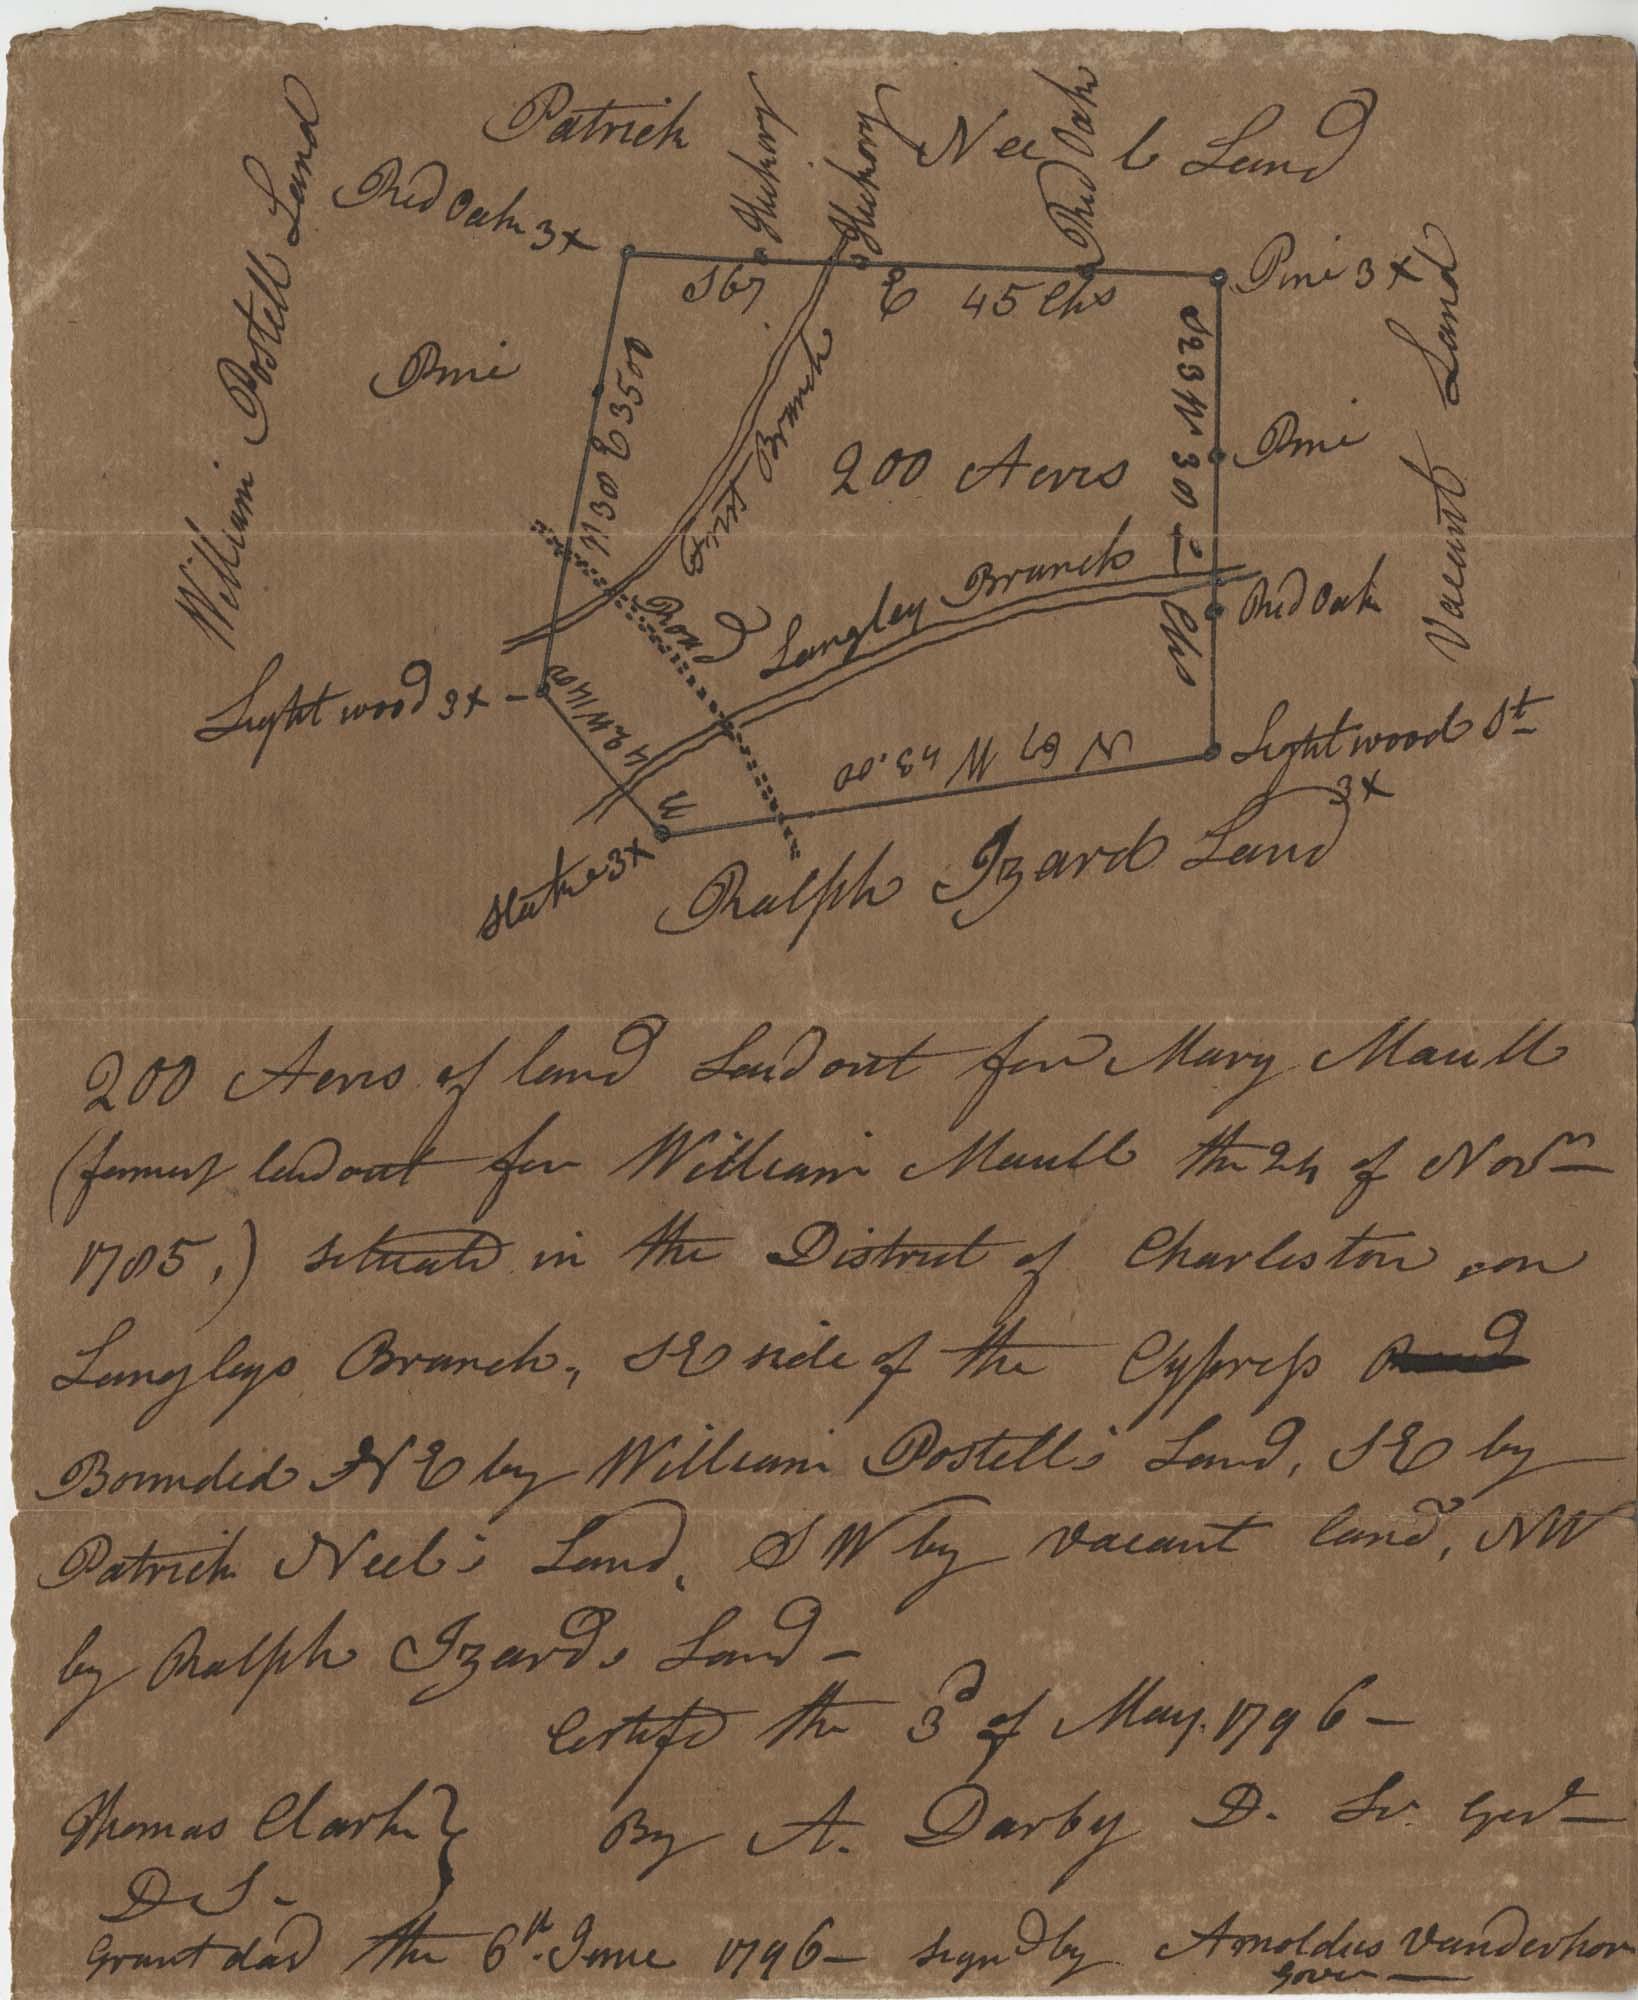 Langley Branch Road Plat 1796